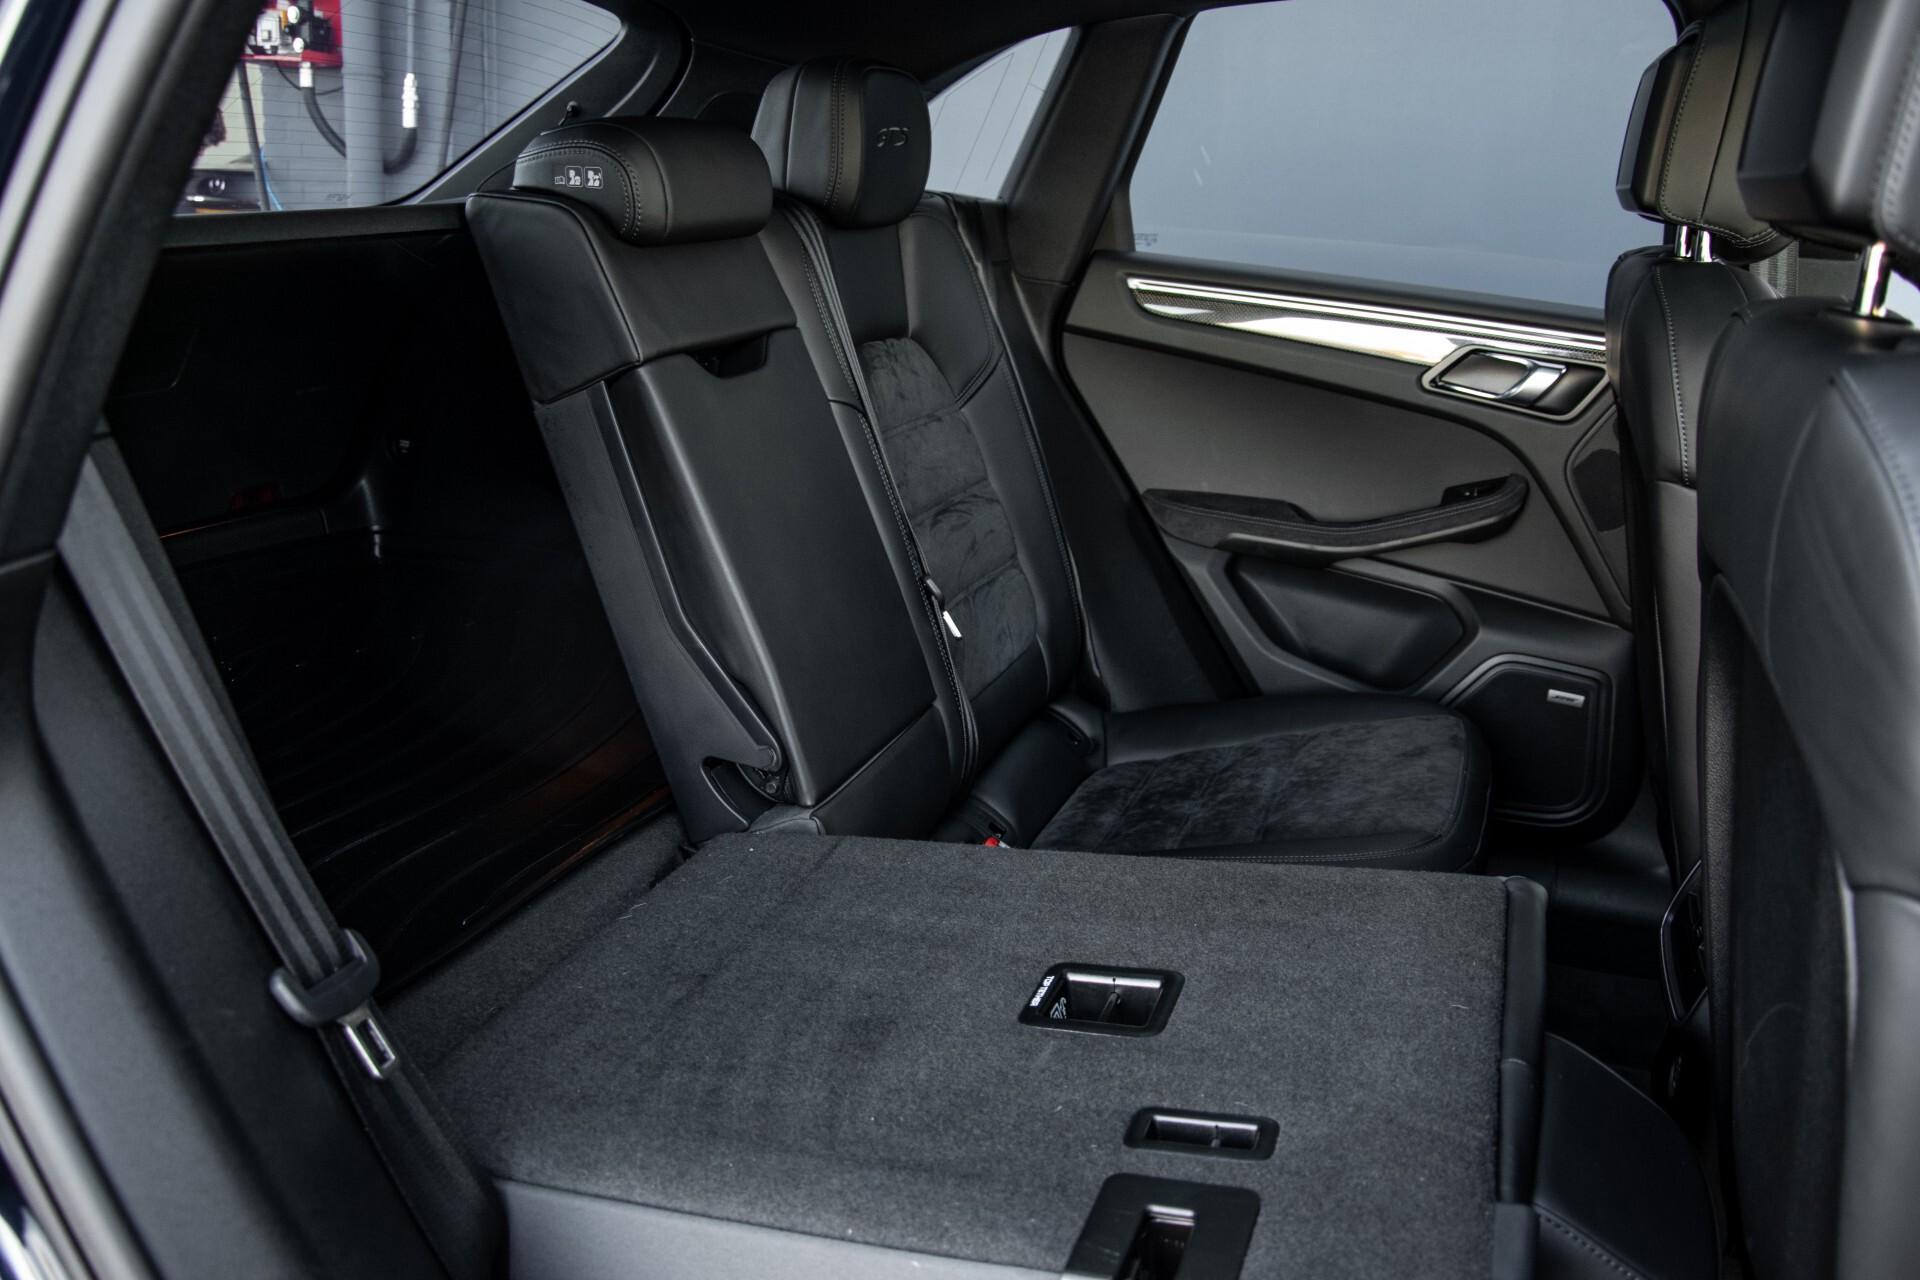 Porsche Macan 3.0 GTS Luchtvering/Panorama/Carbon/Bose/360-camera/Memory/PDLS Aut7 Foto 6